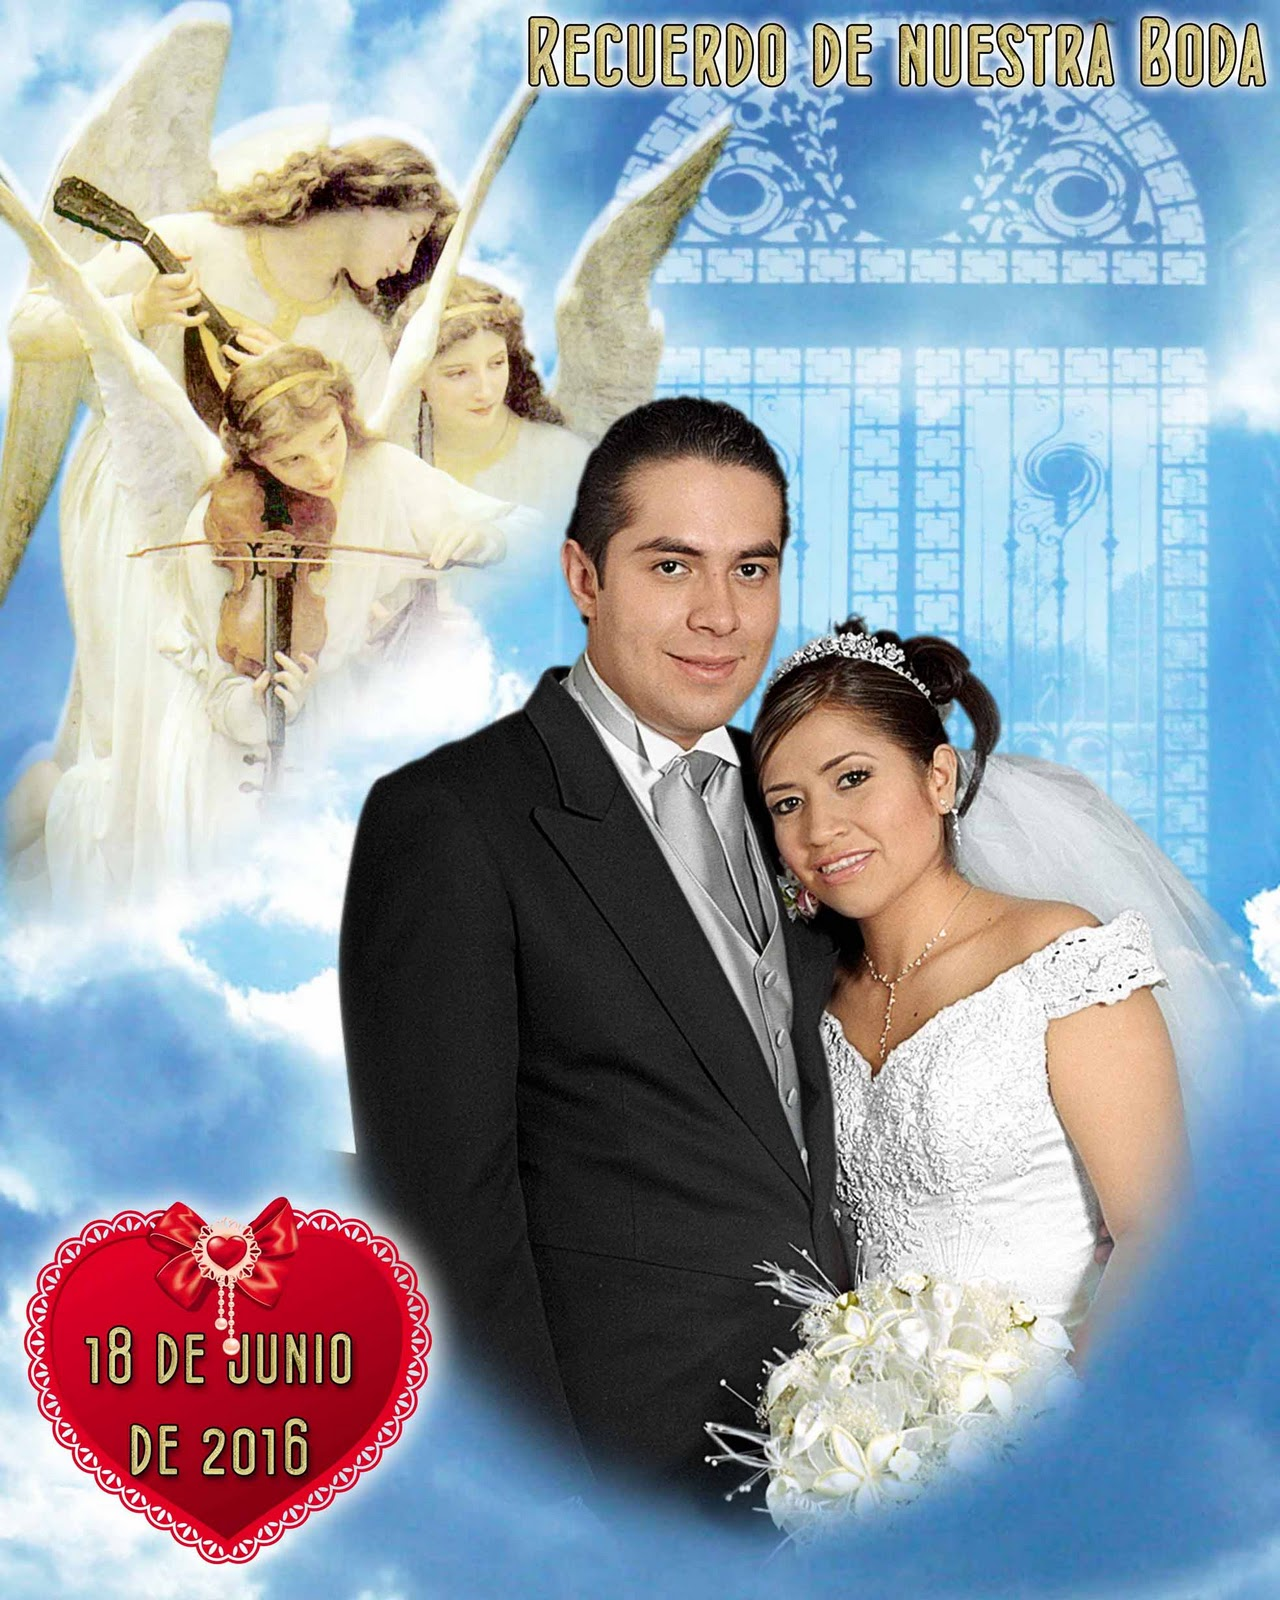 Anillos de boda de vectores All Free Download